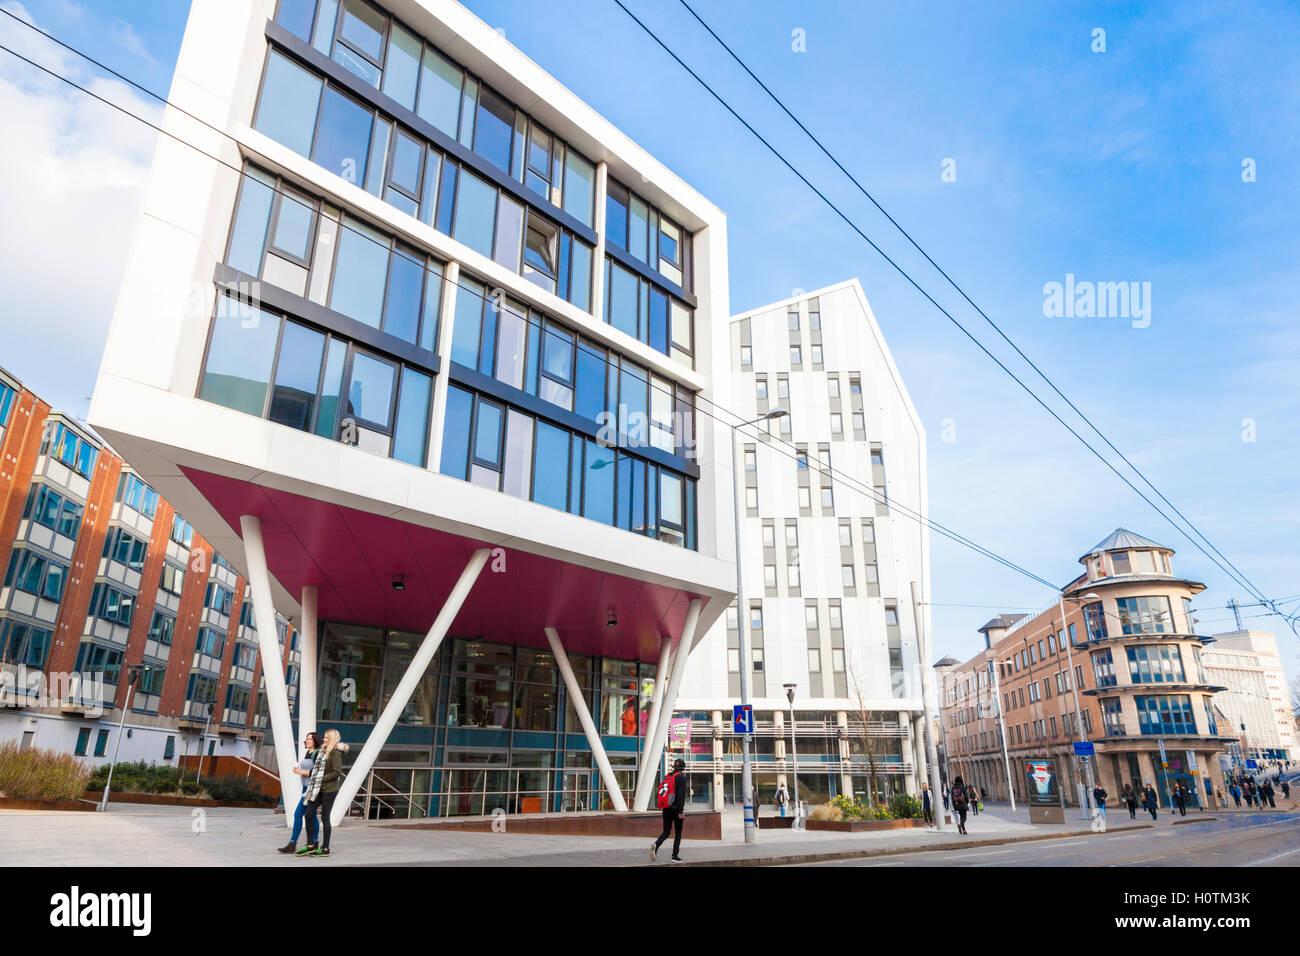 Modern buildings on the City Campus at Nottingham Trent University, Nottingham, England, UK - Stock Image